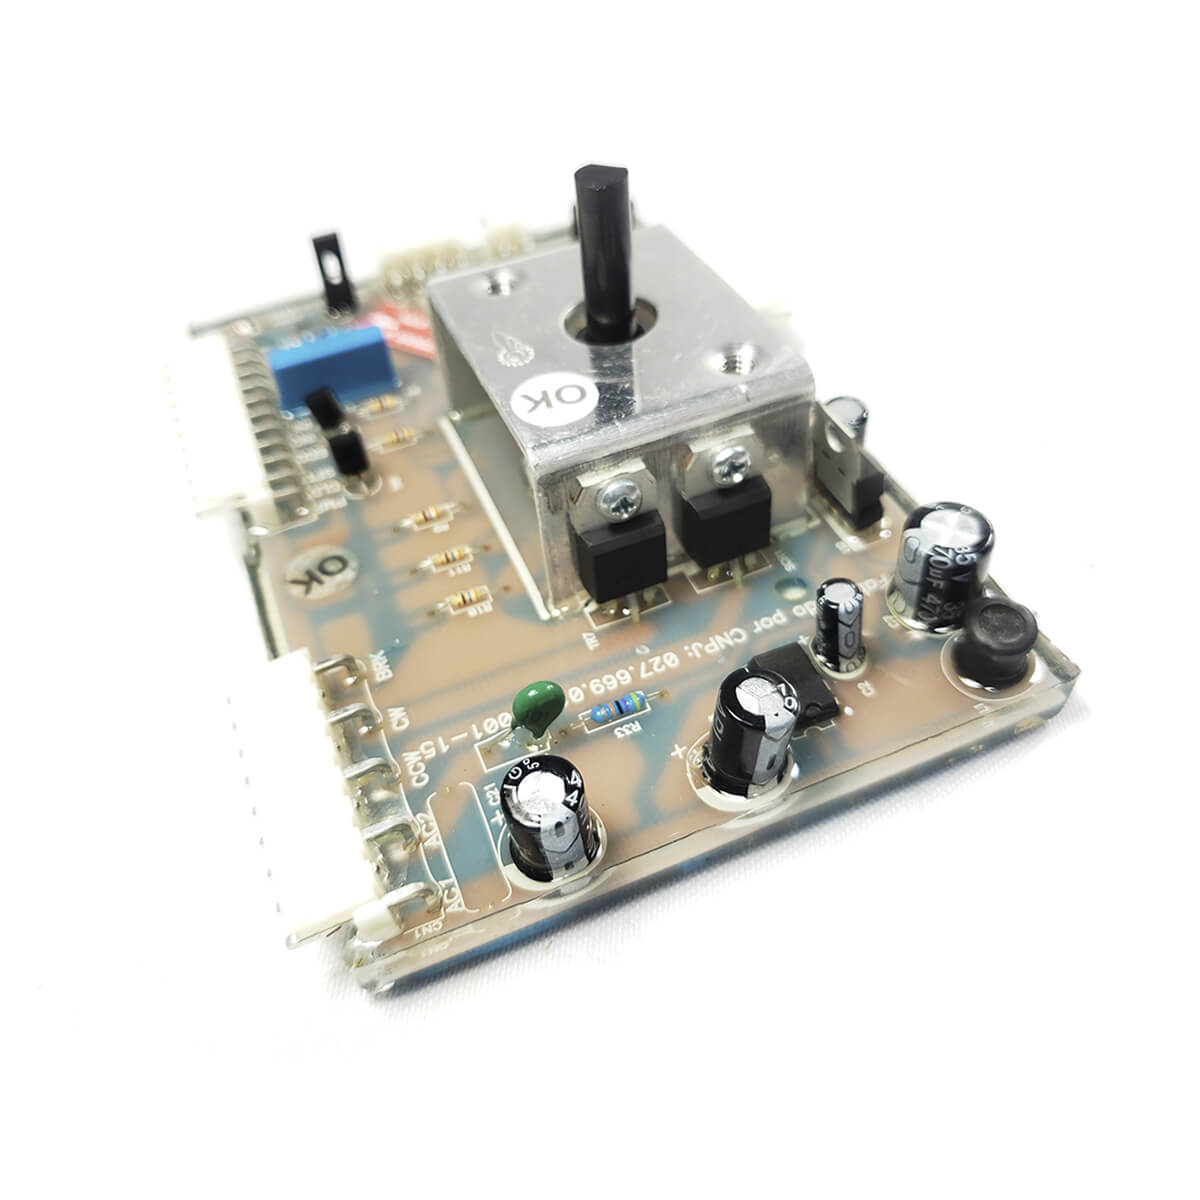 Placa De Potência Alado Para Lavadora De Roupas Electrolux Ltc15 - 70201322